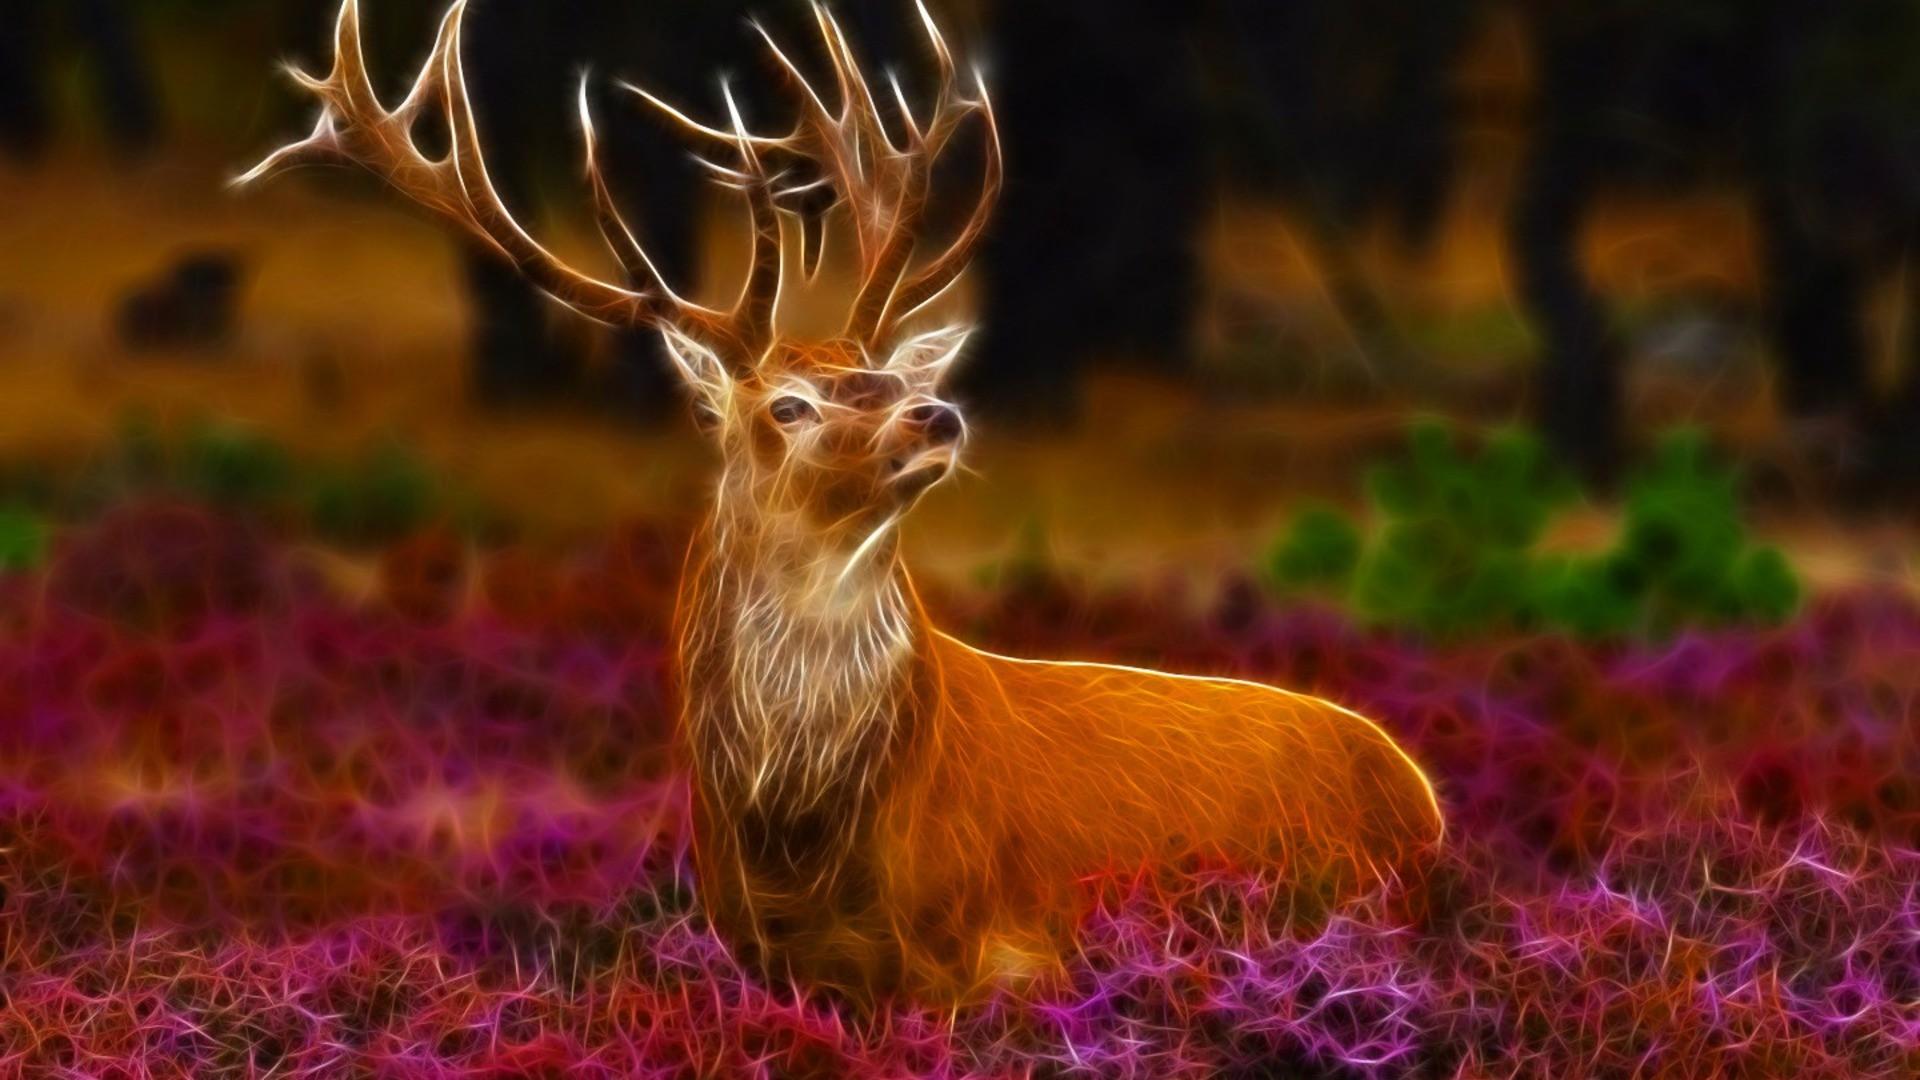 deer images deer hd wallpaper and background photos 40609309